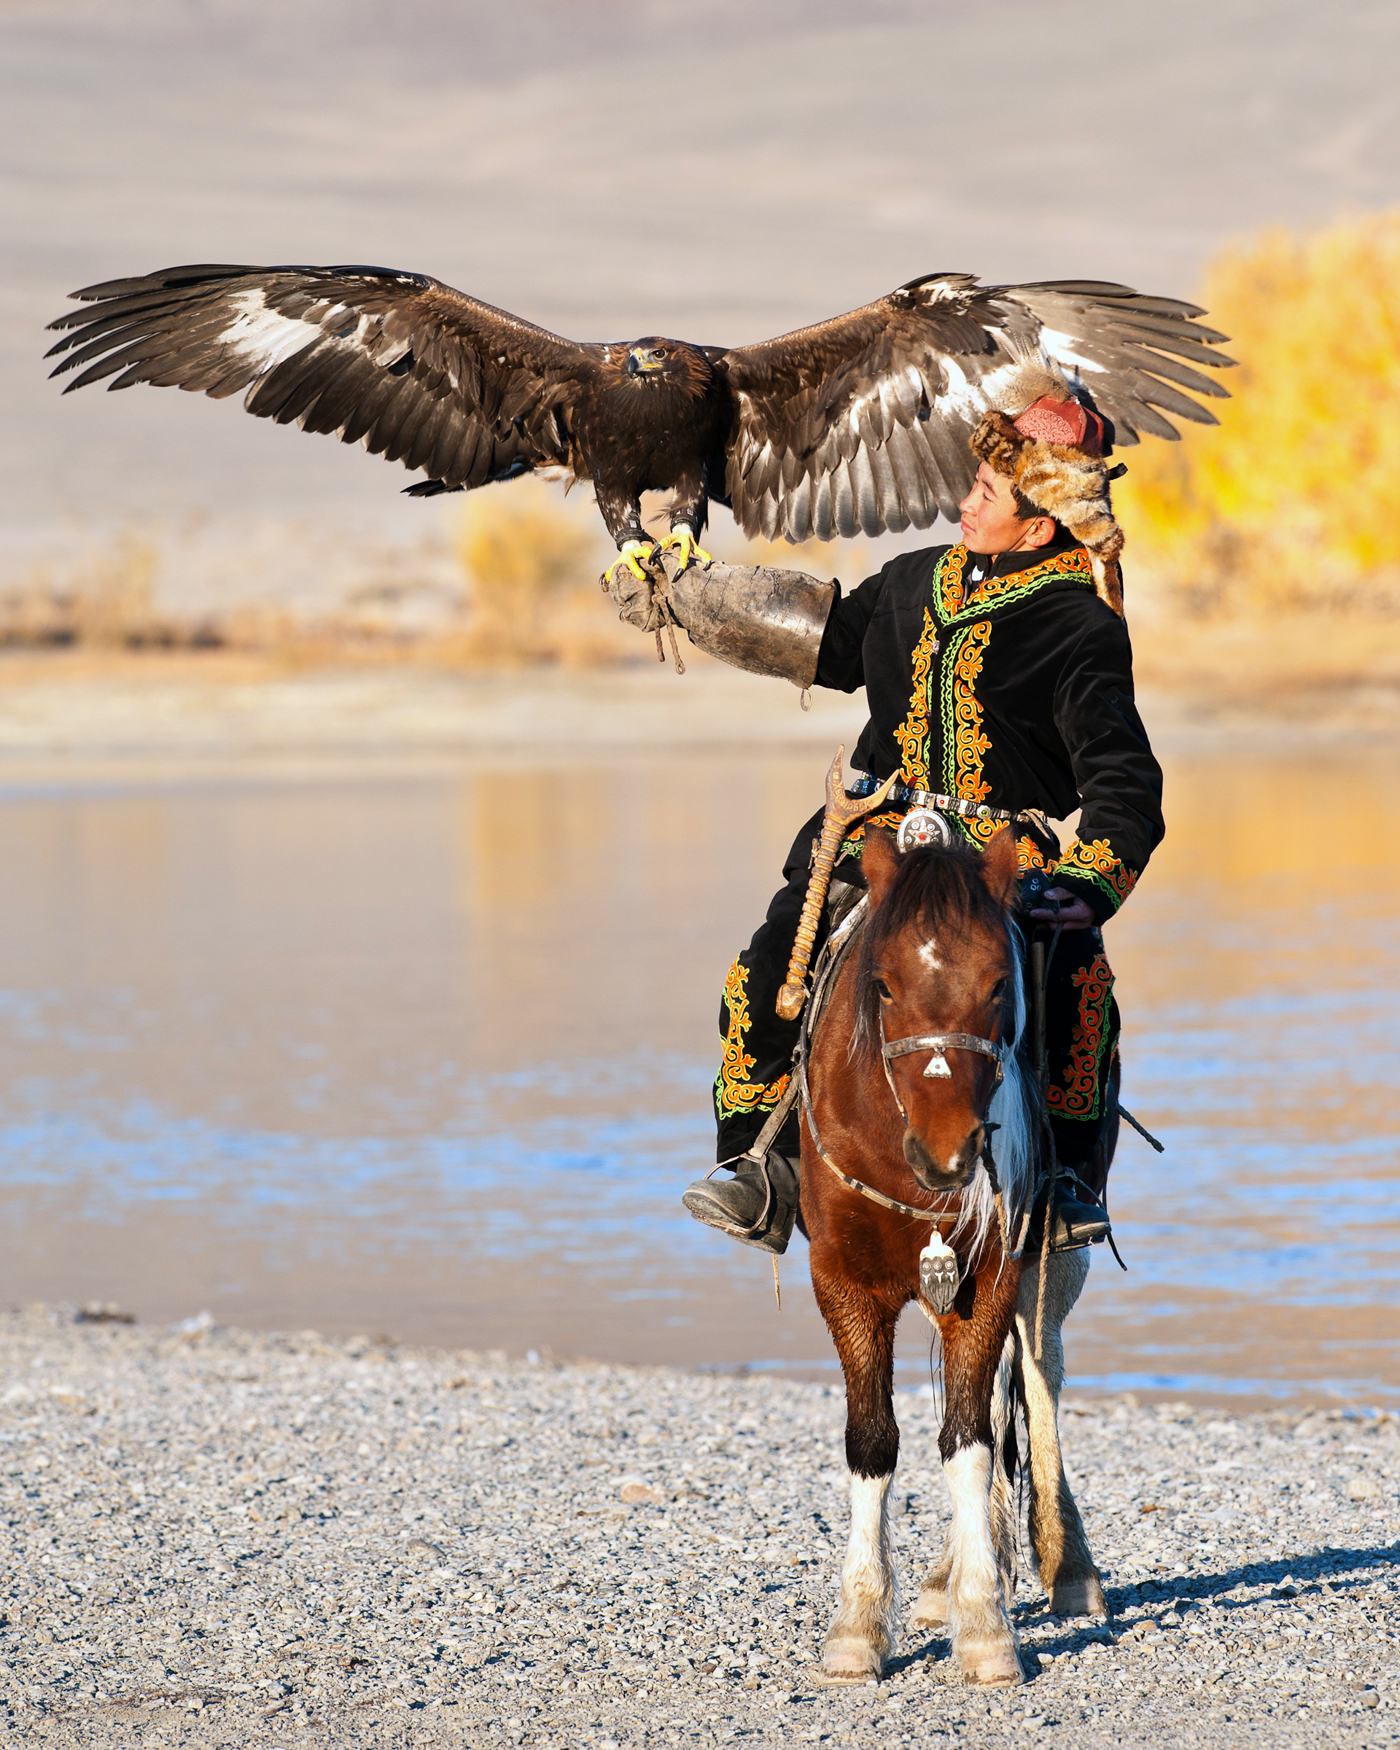 Mongoliaeagles.jpg